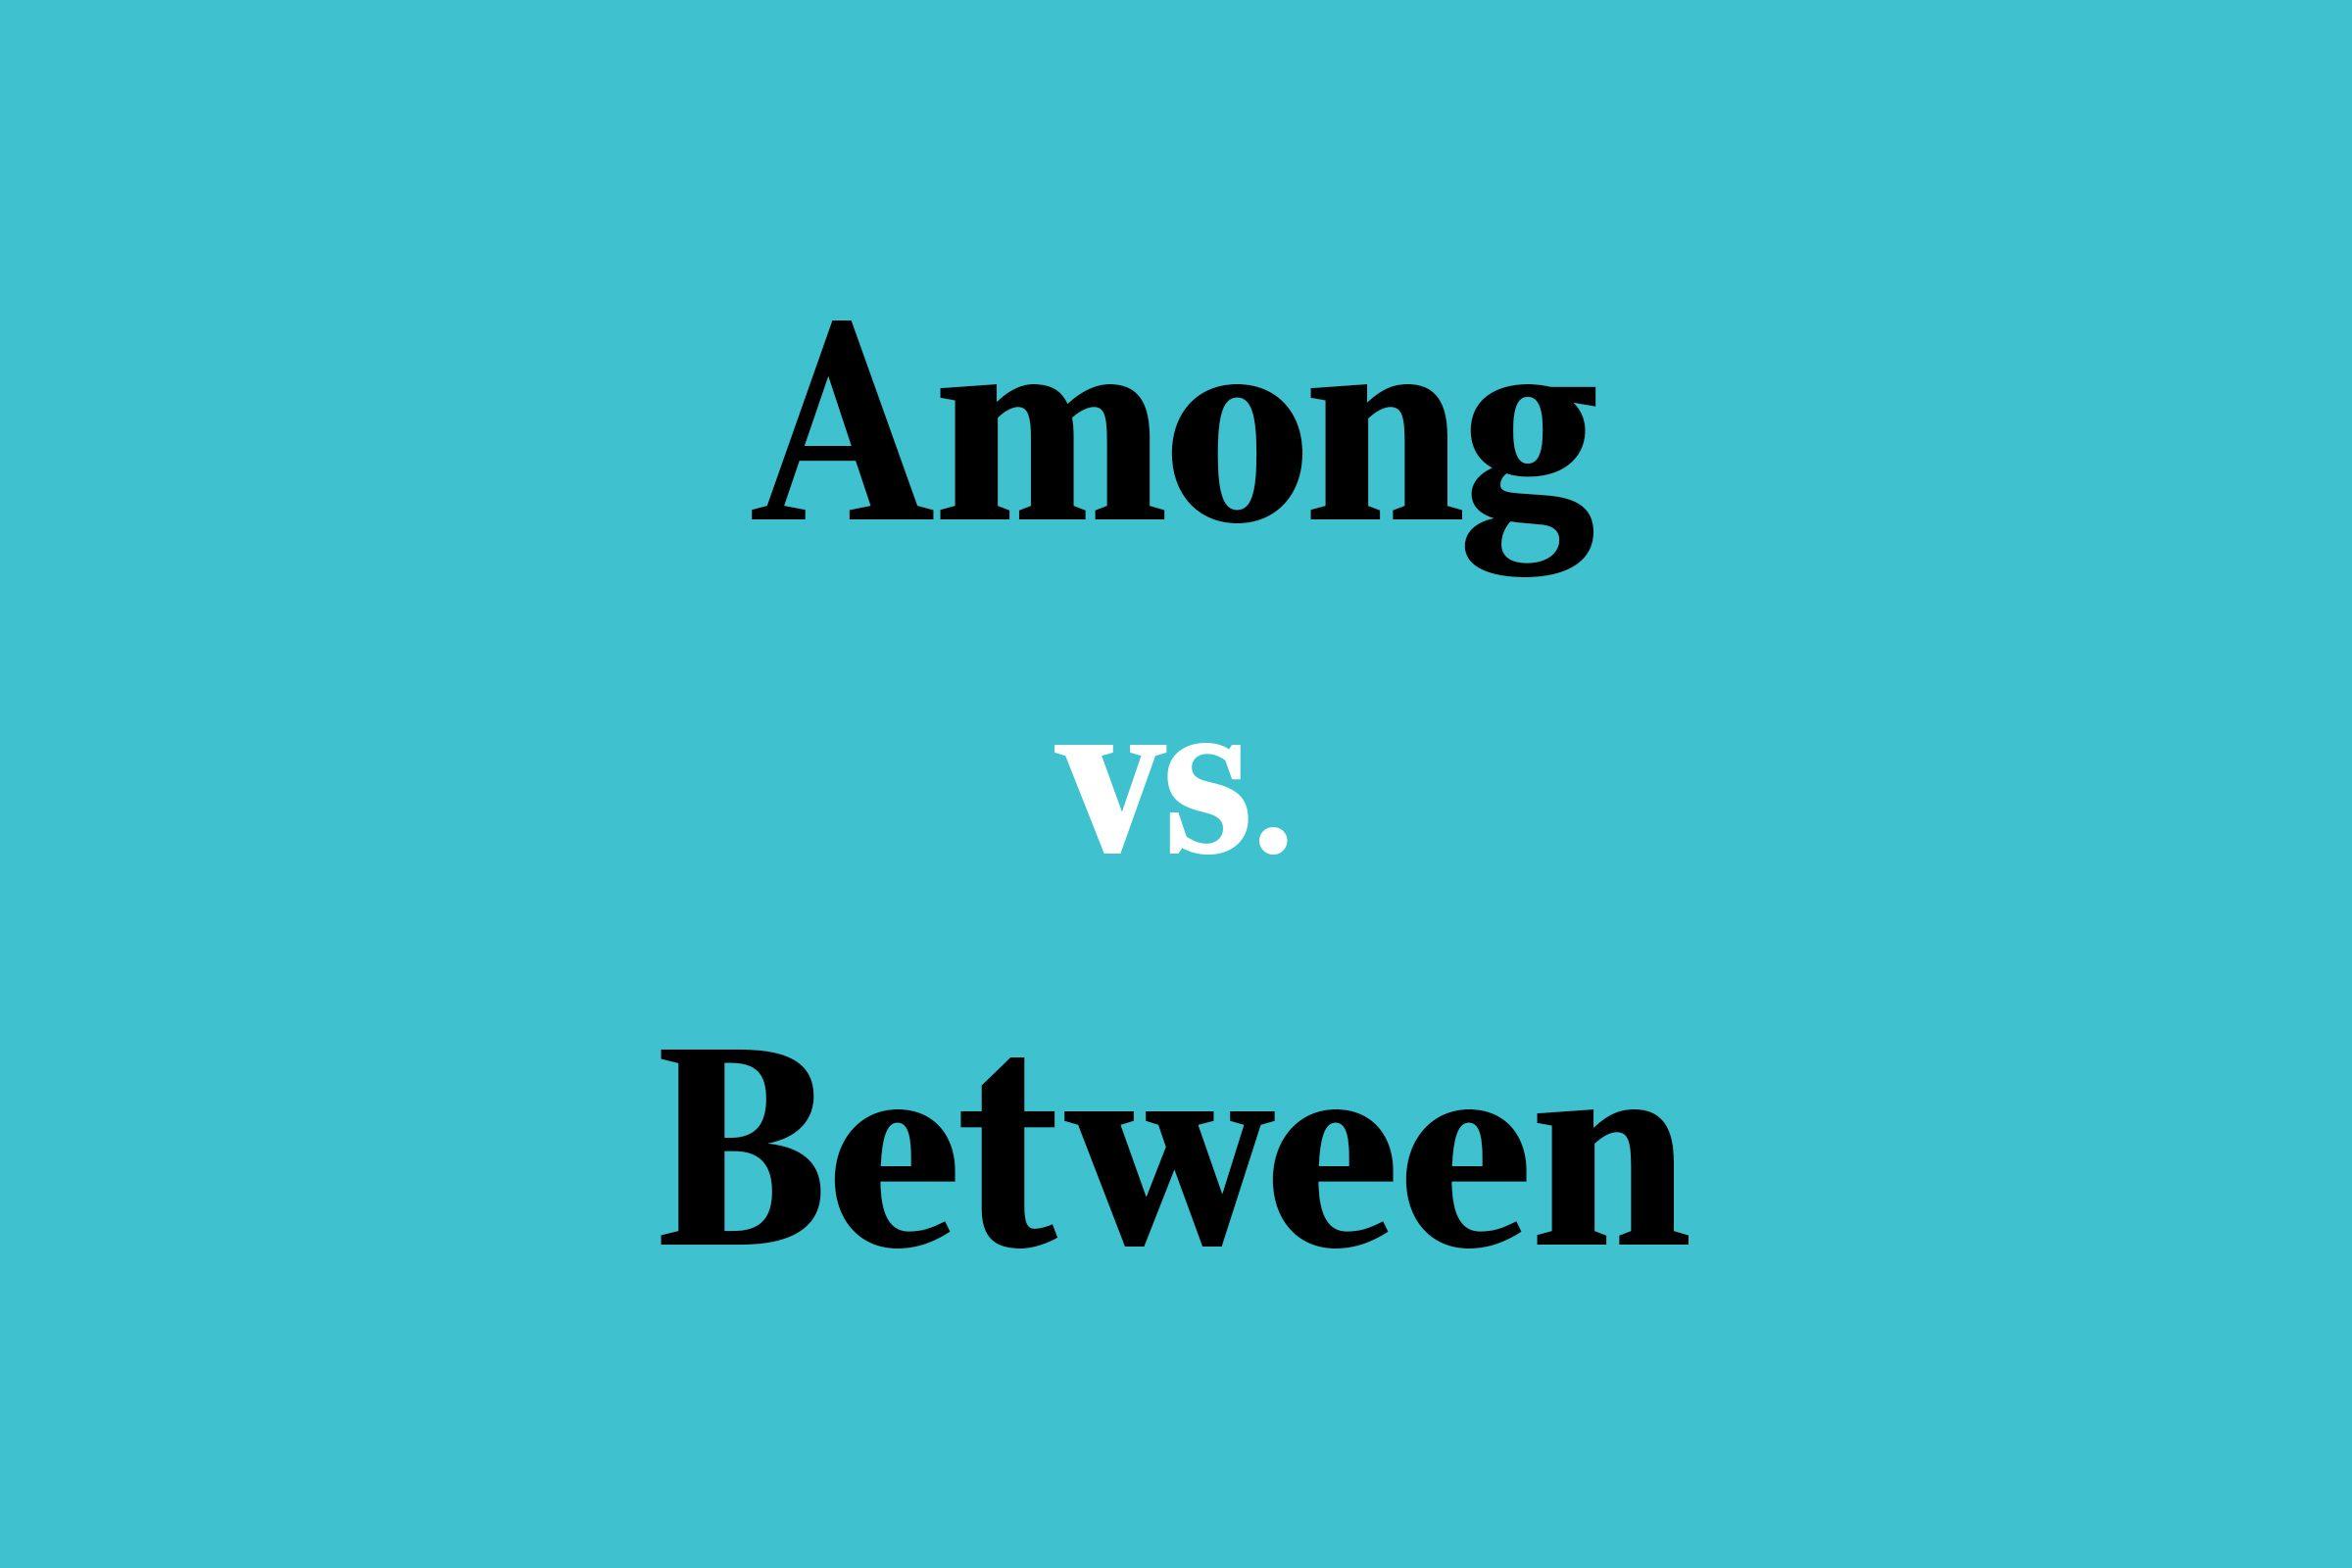 along vs between